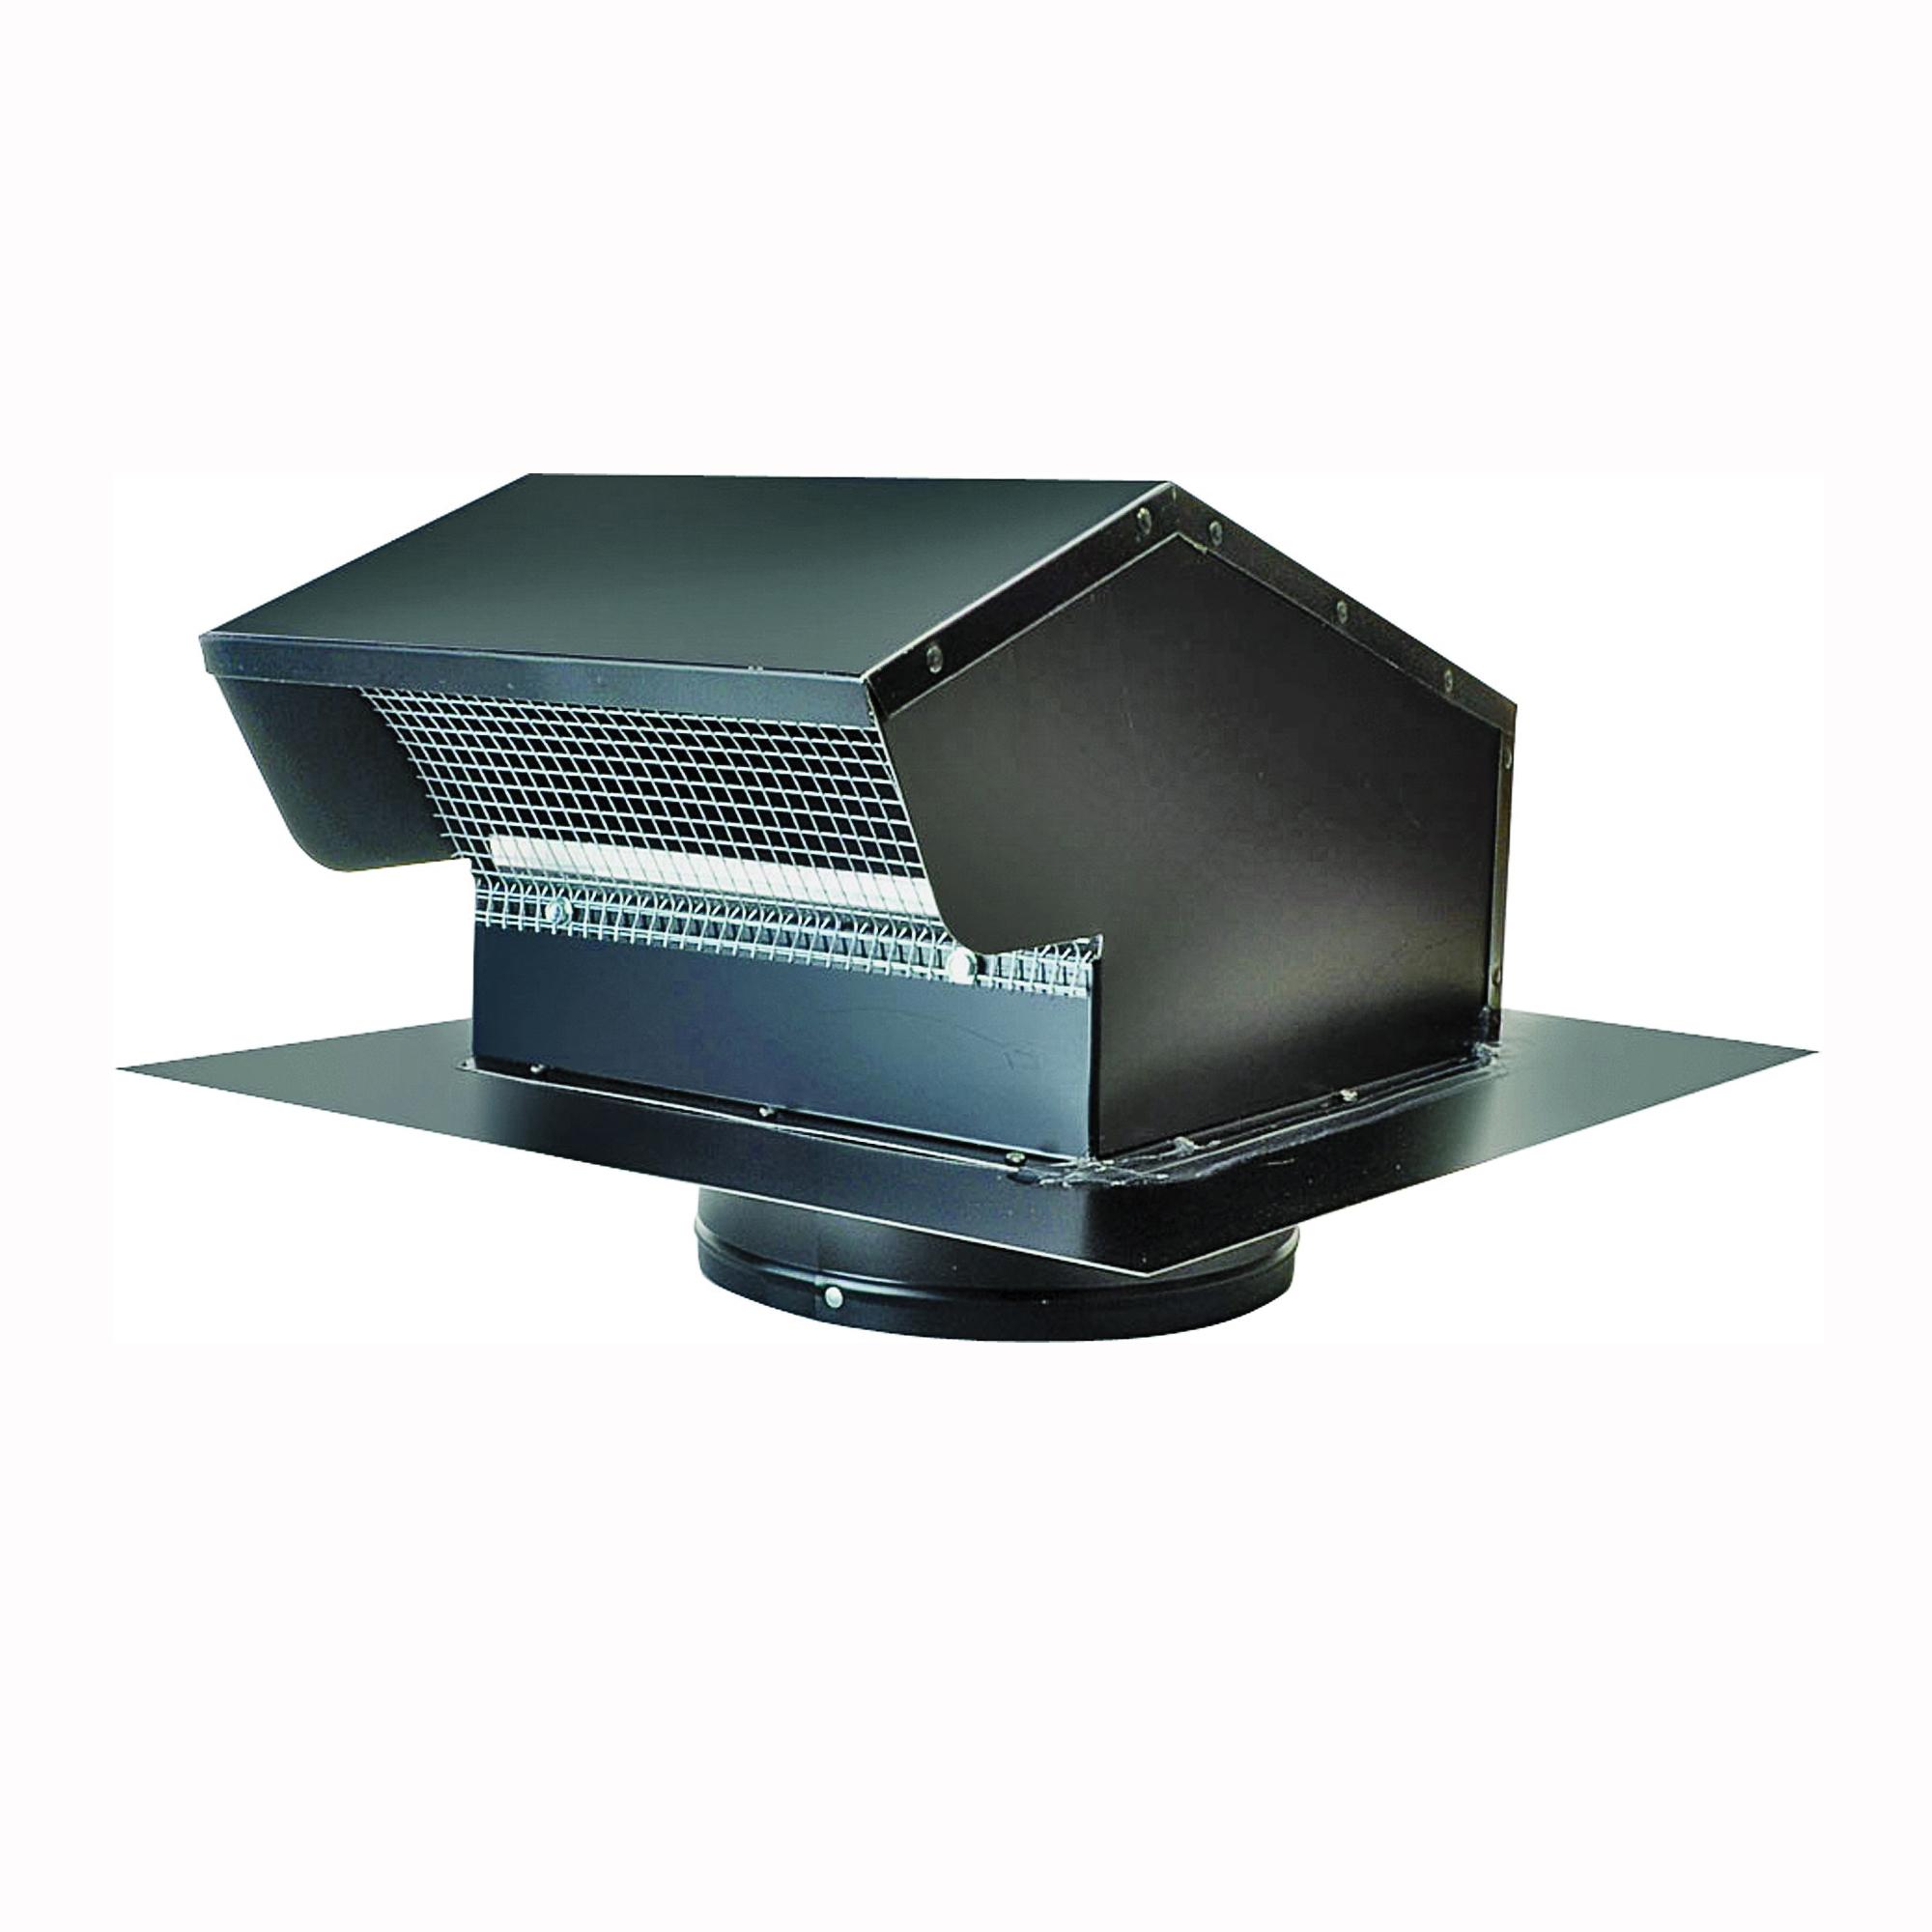 Picture of Master Flow GNV7BL Goose Neck Ventilator, 14-3/4 in W, Galvanized Steel, Black